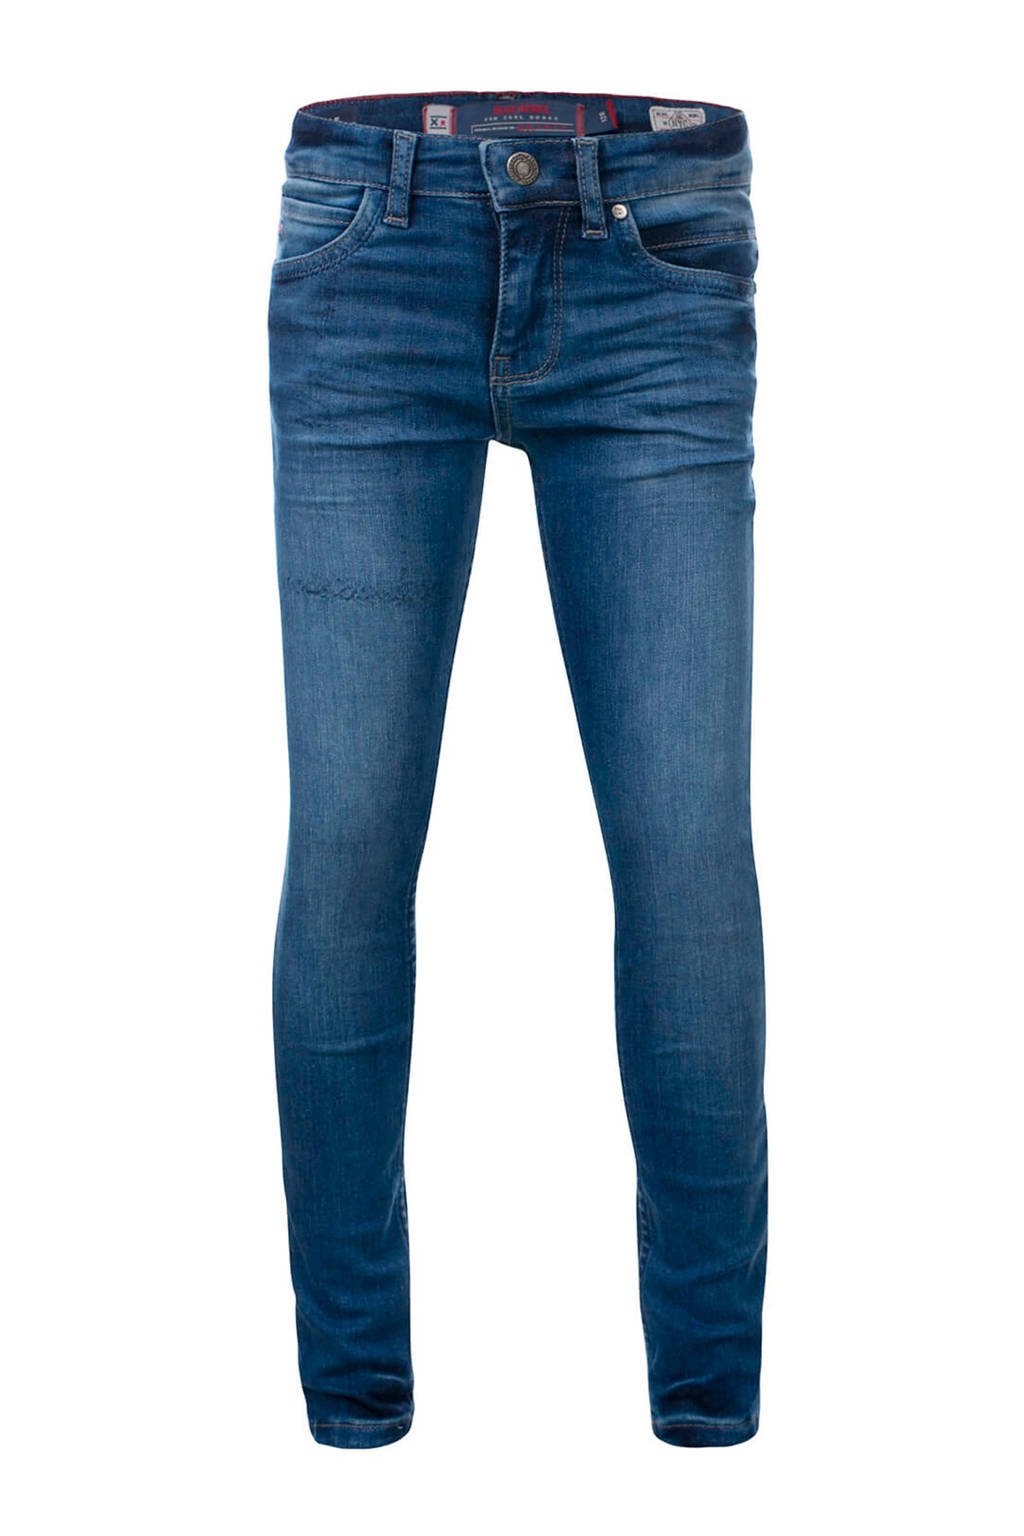 Blue Rebel skinny jeans Tile blauw (tahoe wash), Blauw (Tahoe wash)